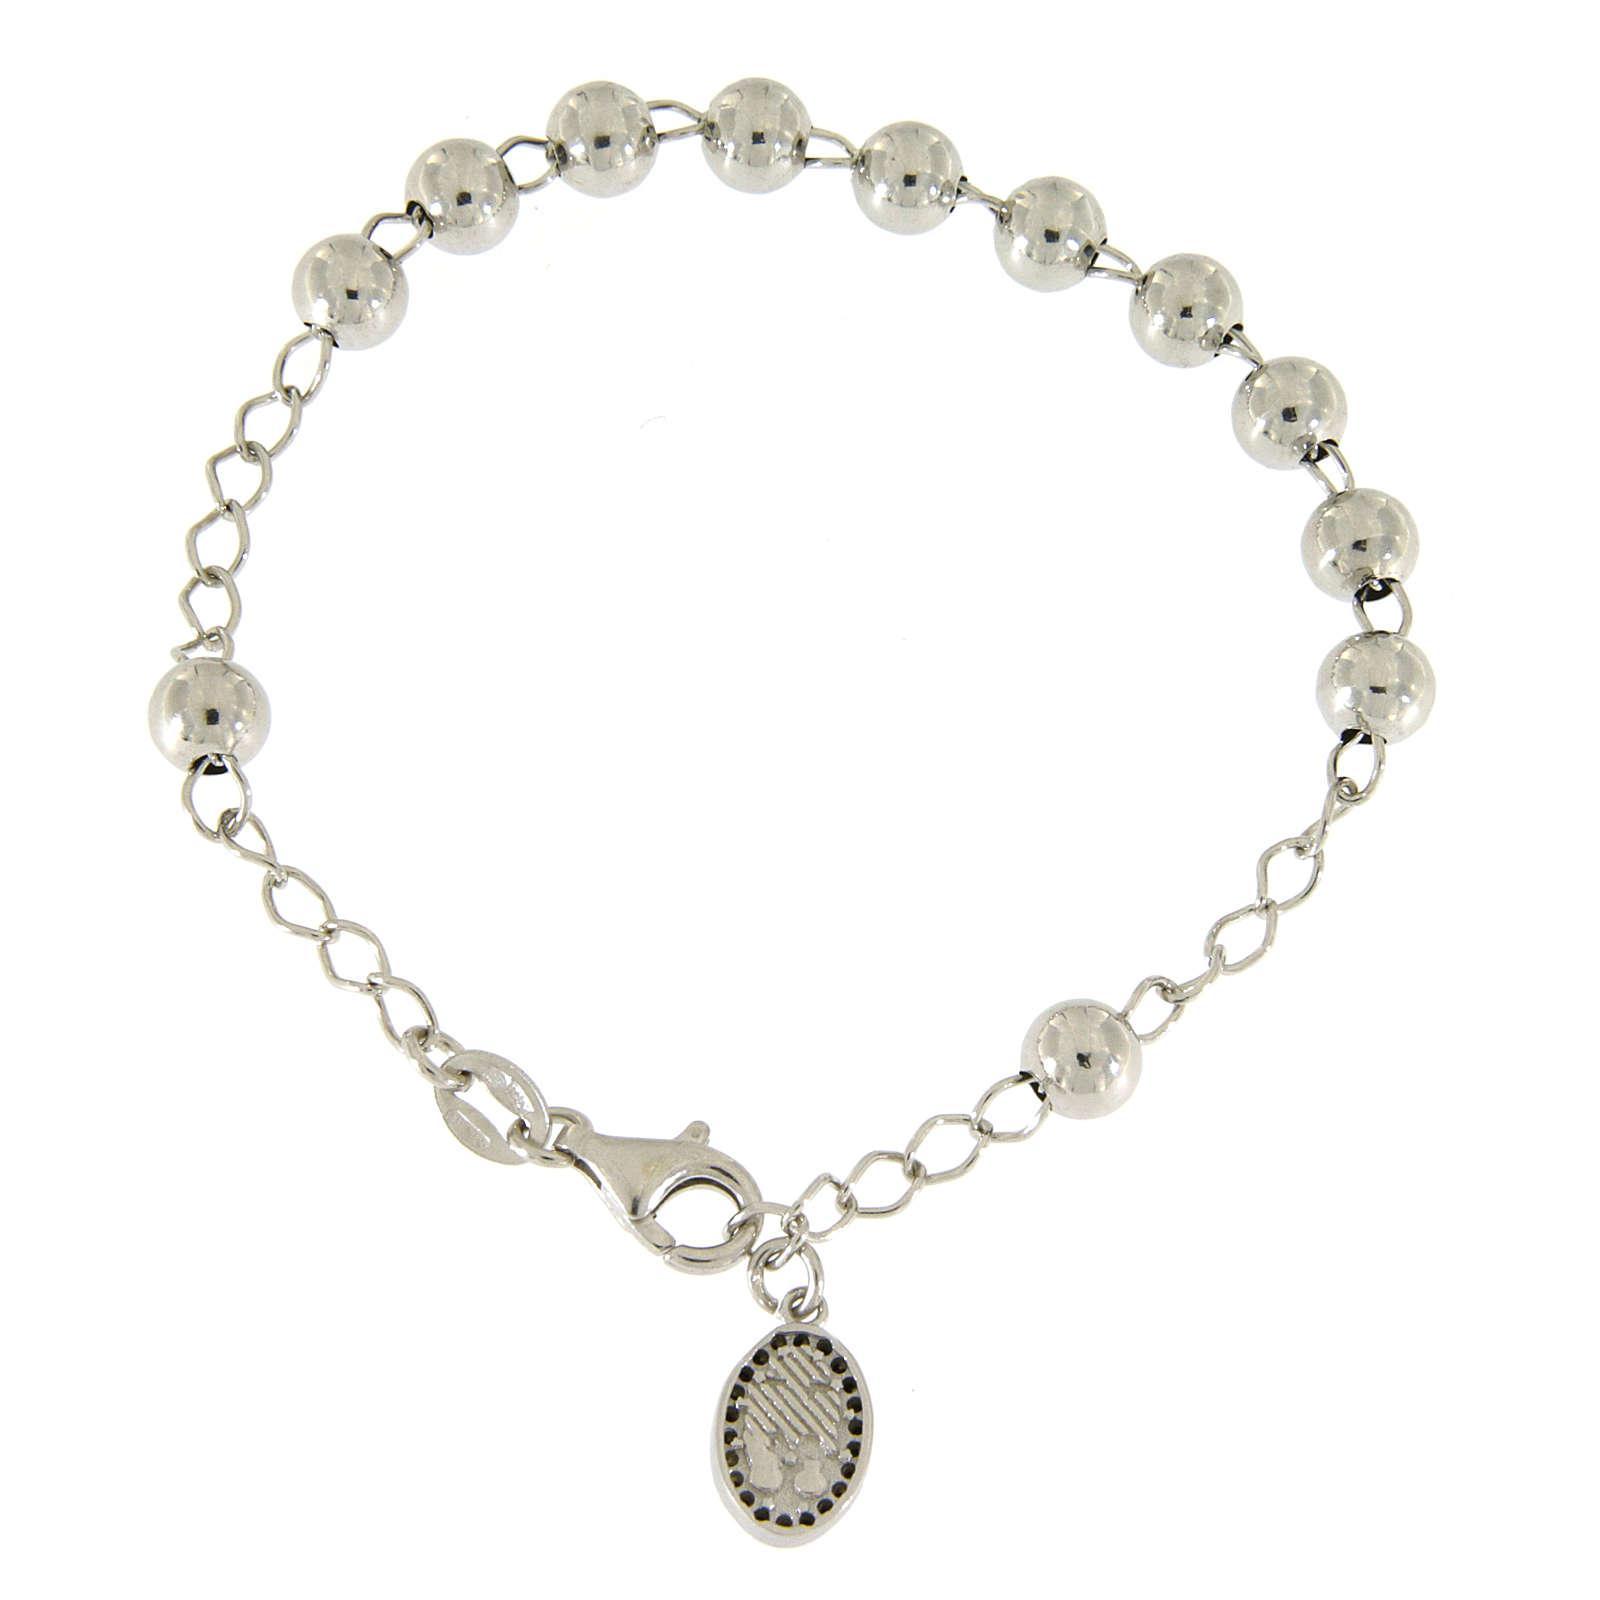 Bracciale religioso argento 925 pallina 6 mm S. Rita zirconi neri 4